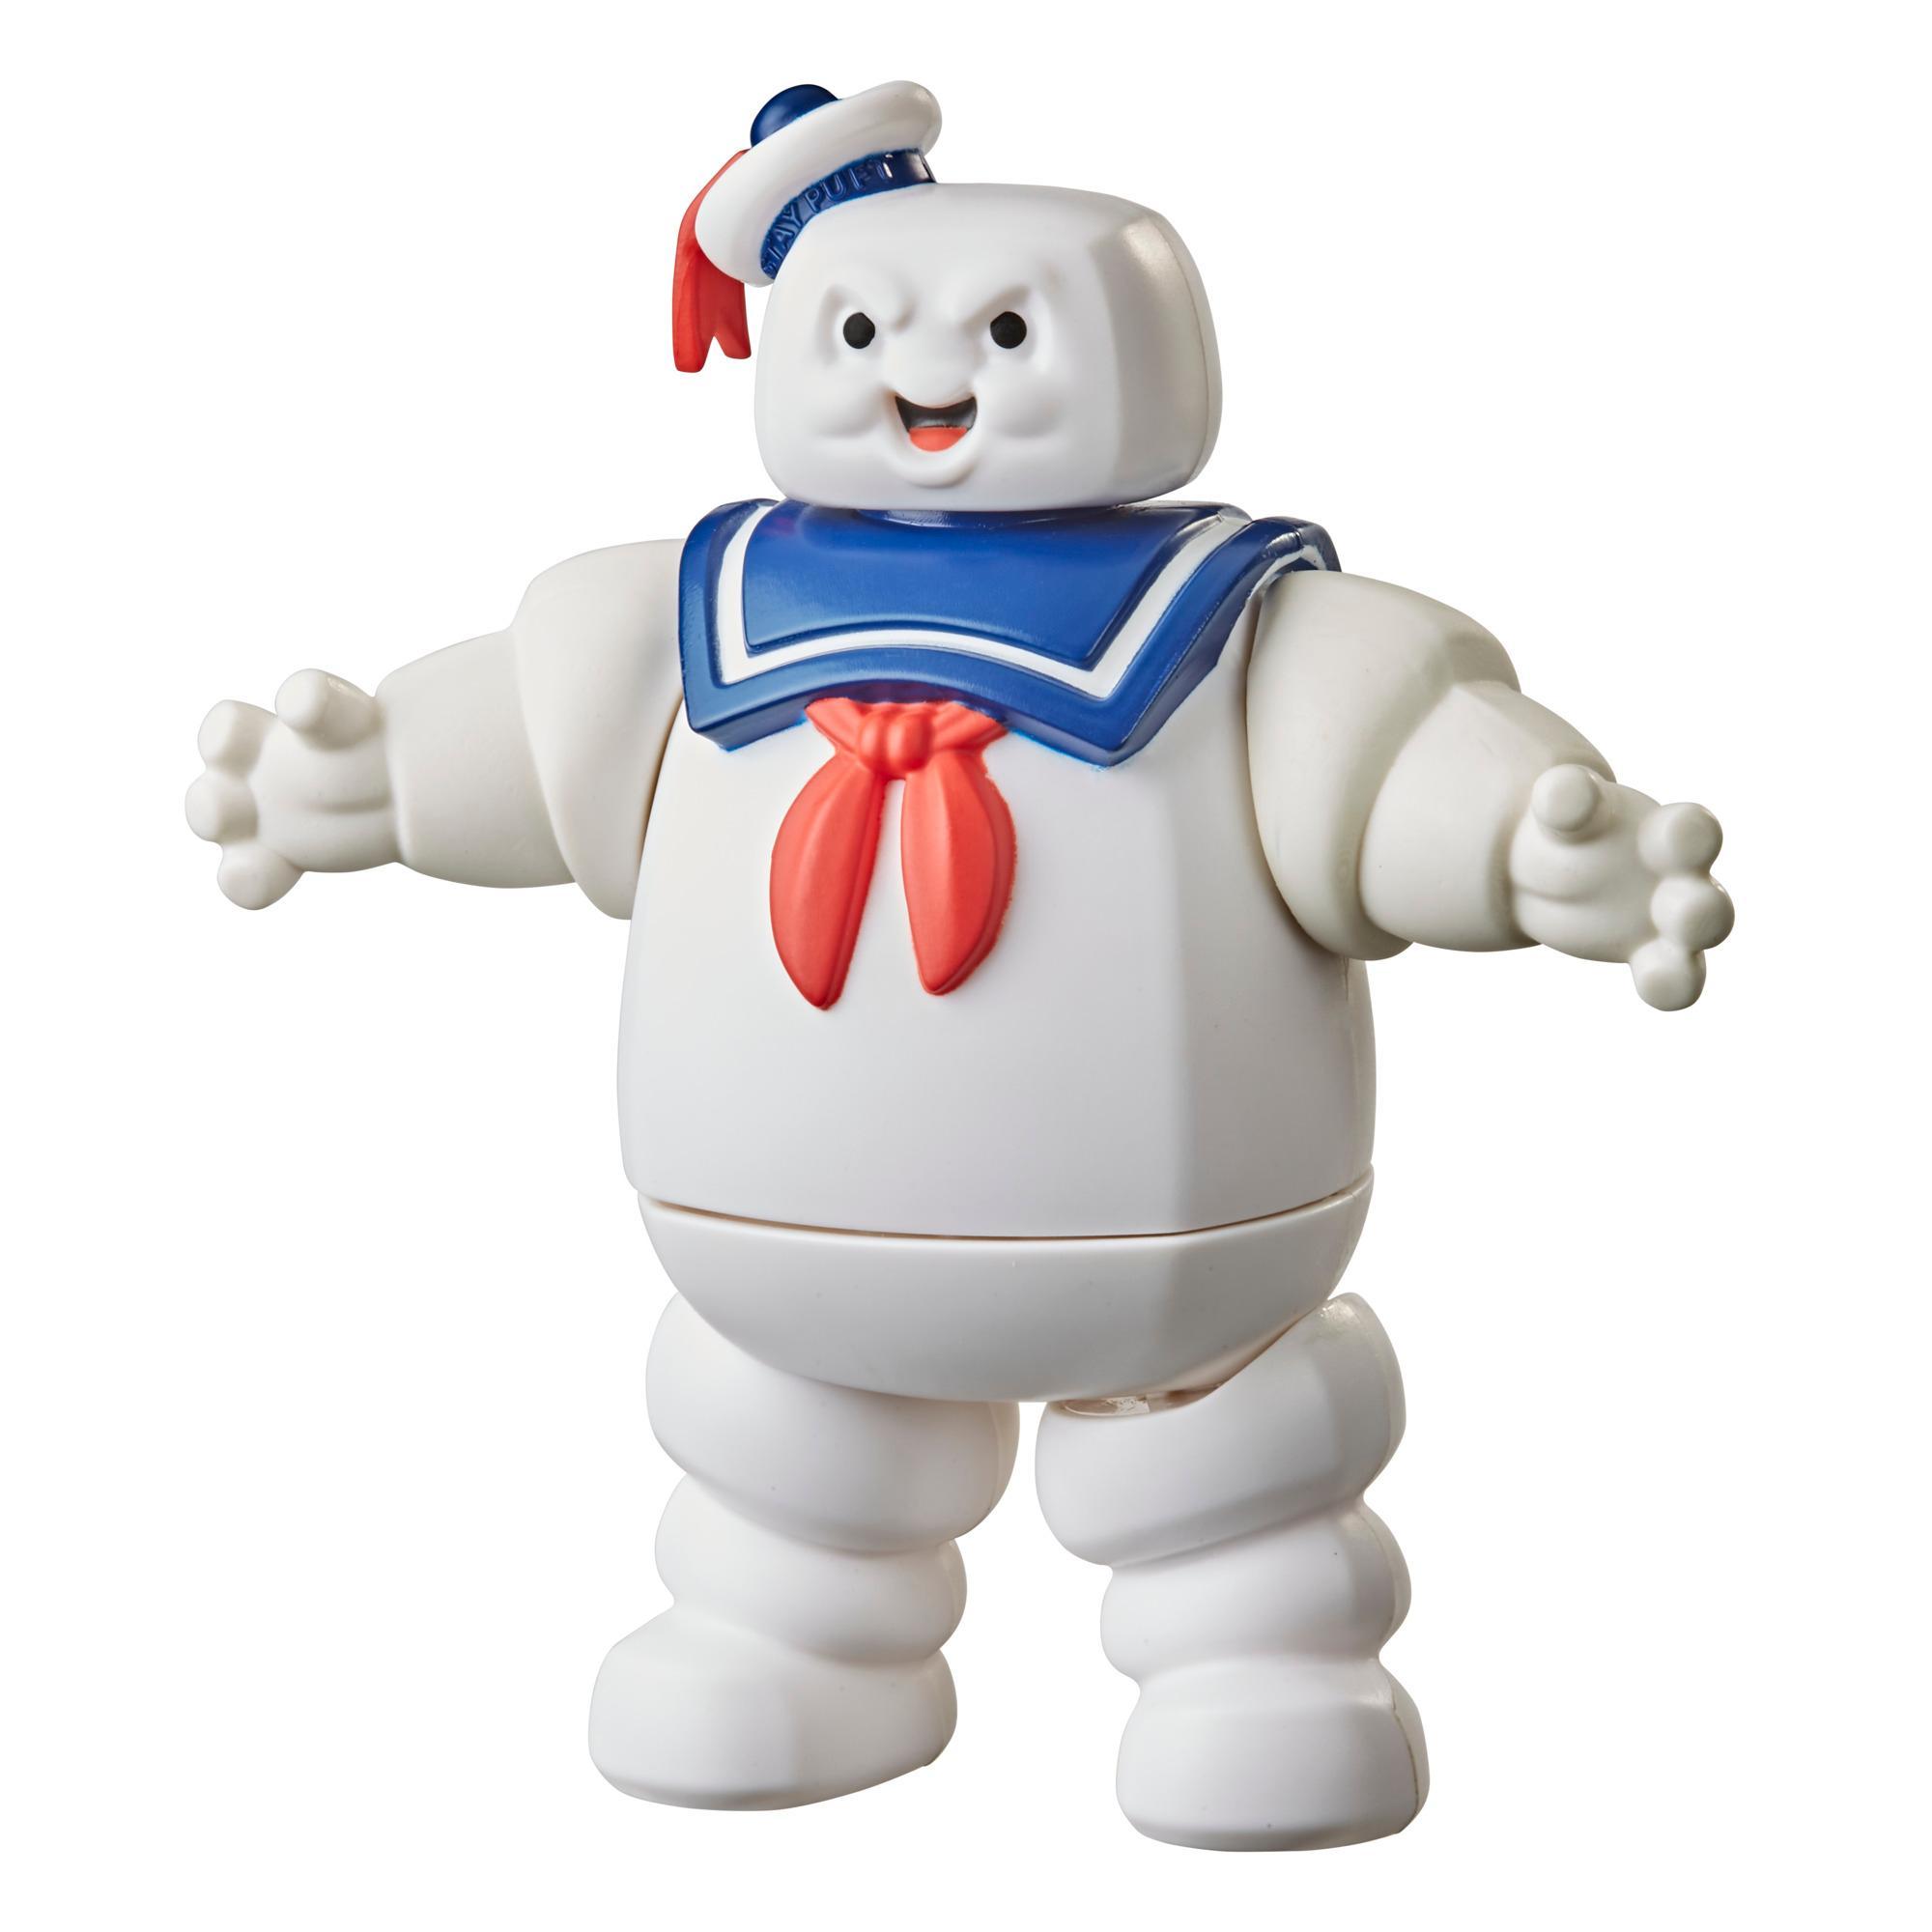 Ghostbusters Geisterschreck Stay Puft Marshmallow-Mann